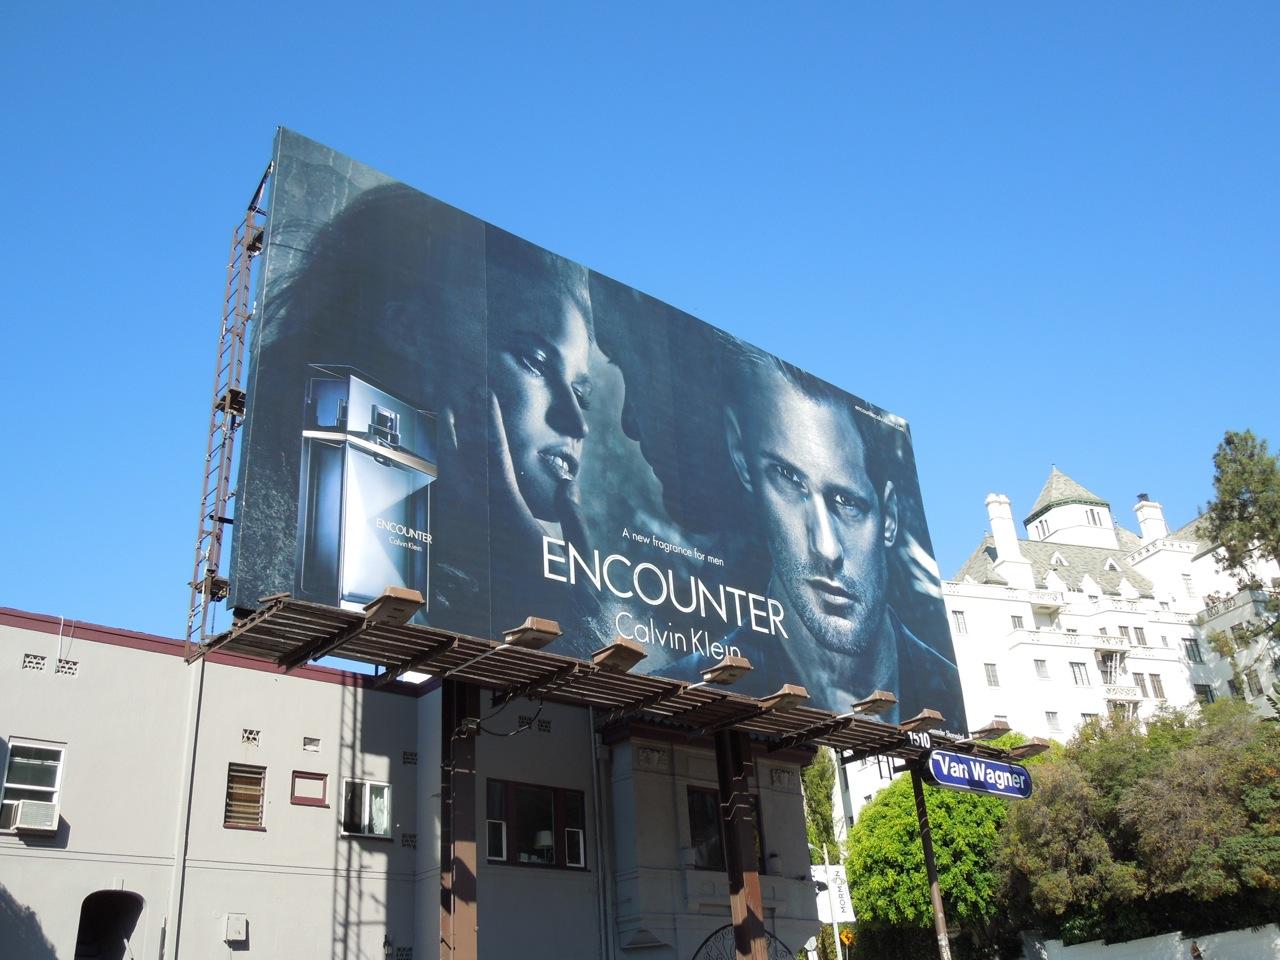 http://2.bp.blogspot.com/-NIJi4KreEGY/UGJIQ8QJRRI/AAAAAAAA010/BTomcuBOjLg/s1600/CK+encounter+Skarsgard+billboard.jpg